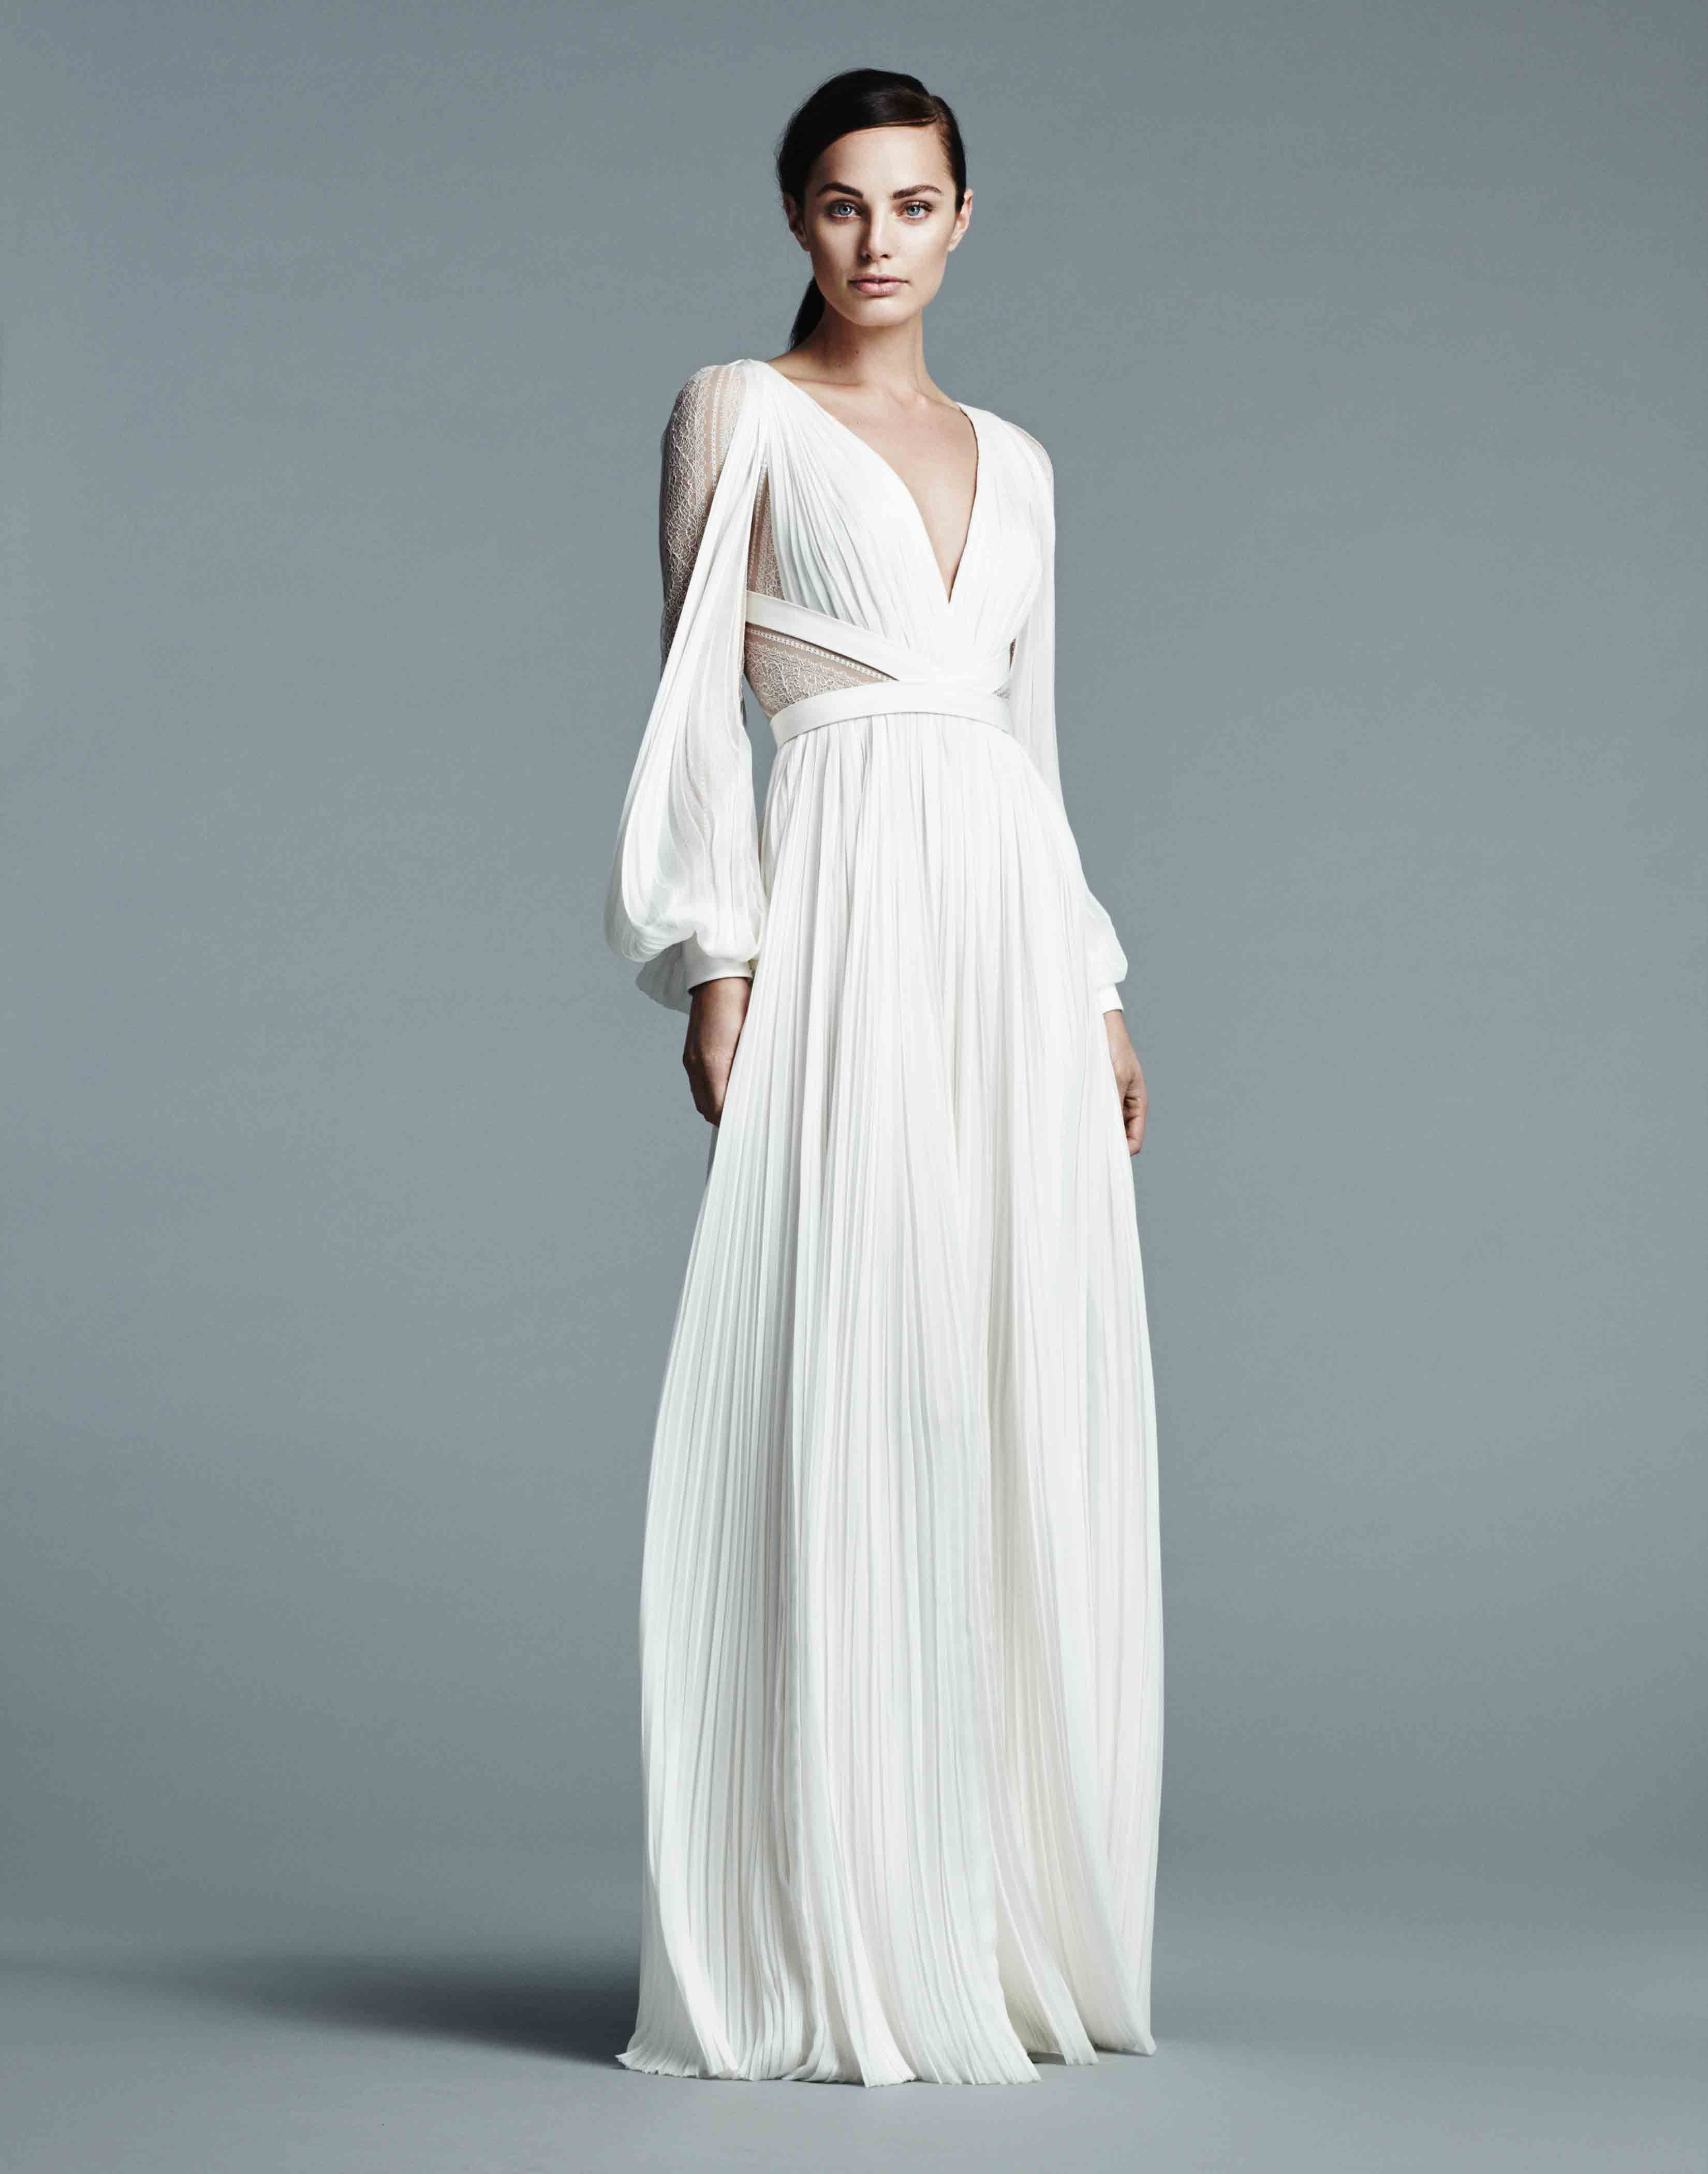 J.Mendel | wedding dress | Pinterest | Trajes para bodas, Traje y Boda